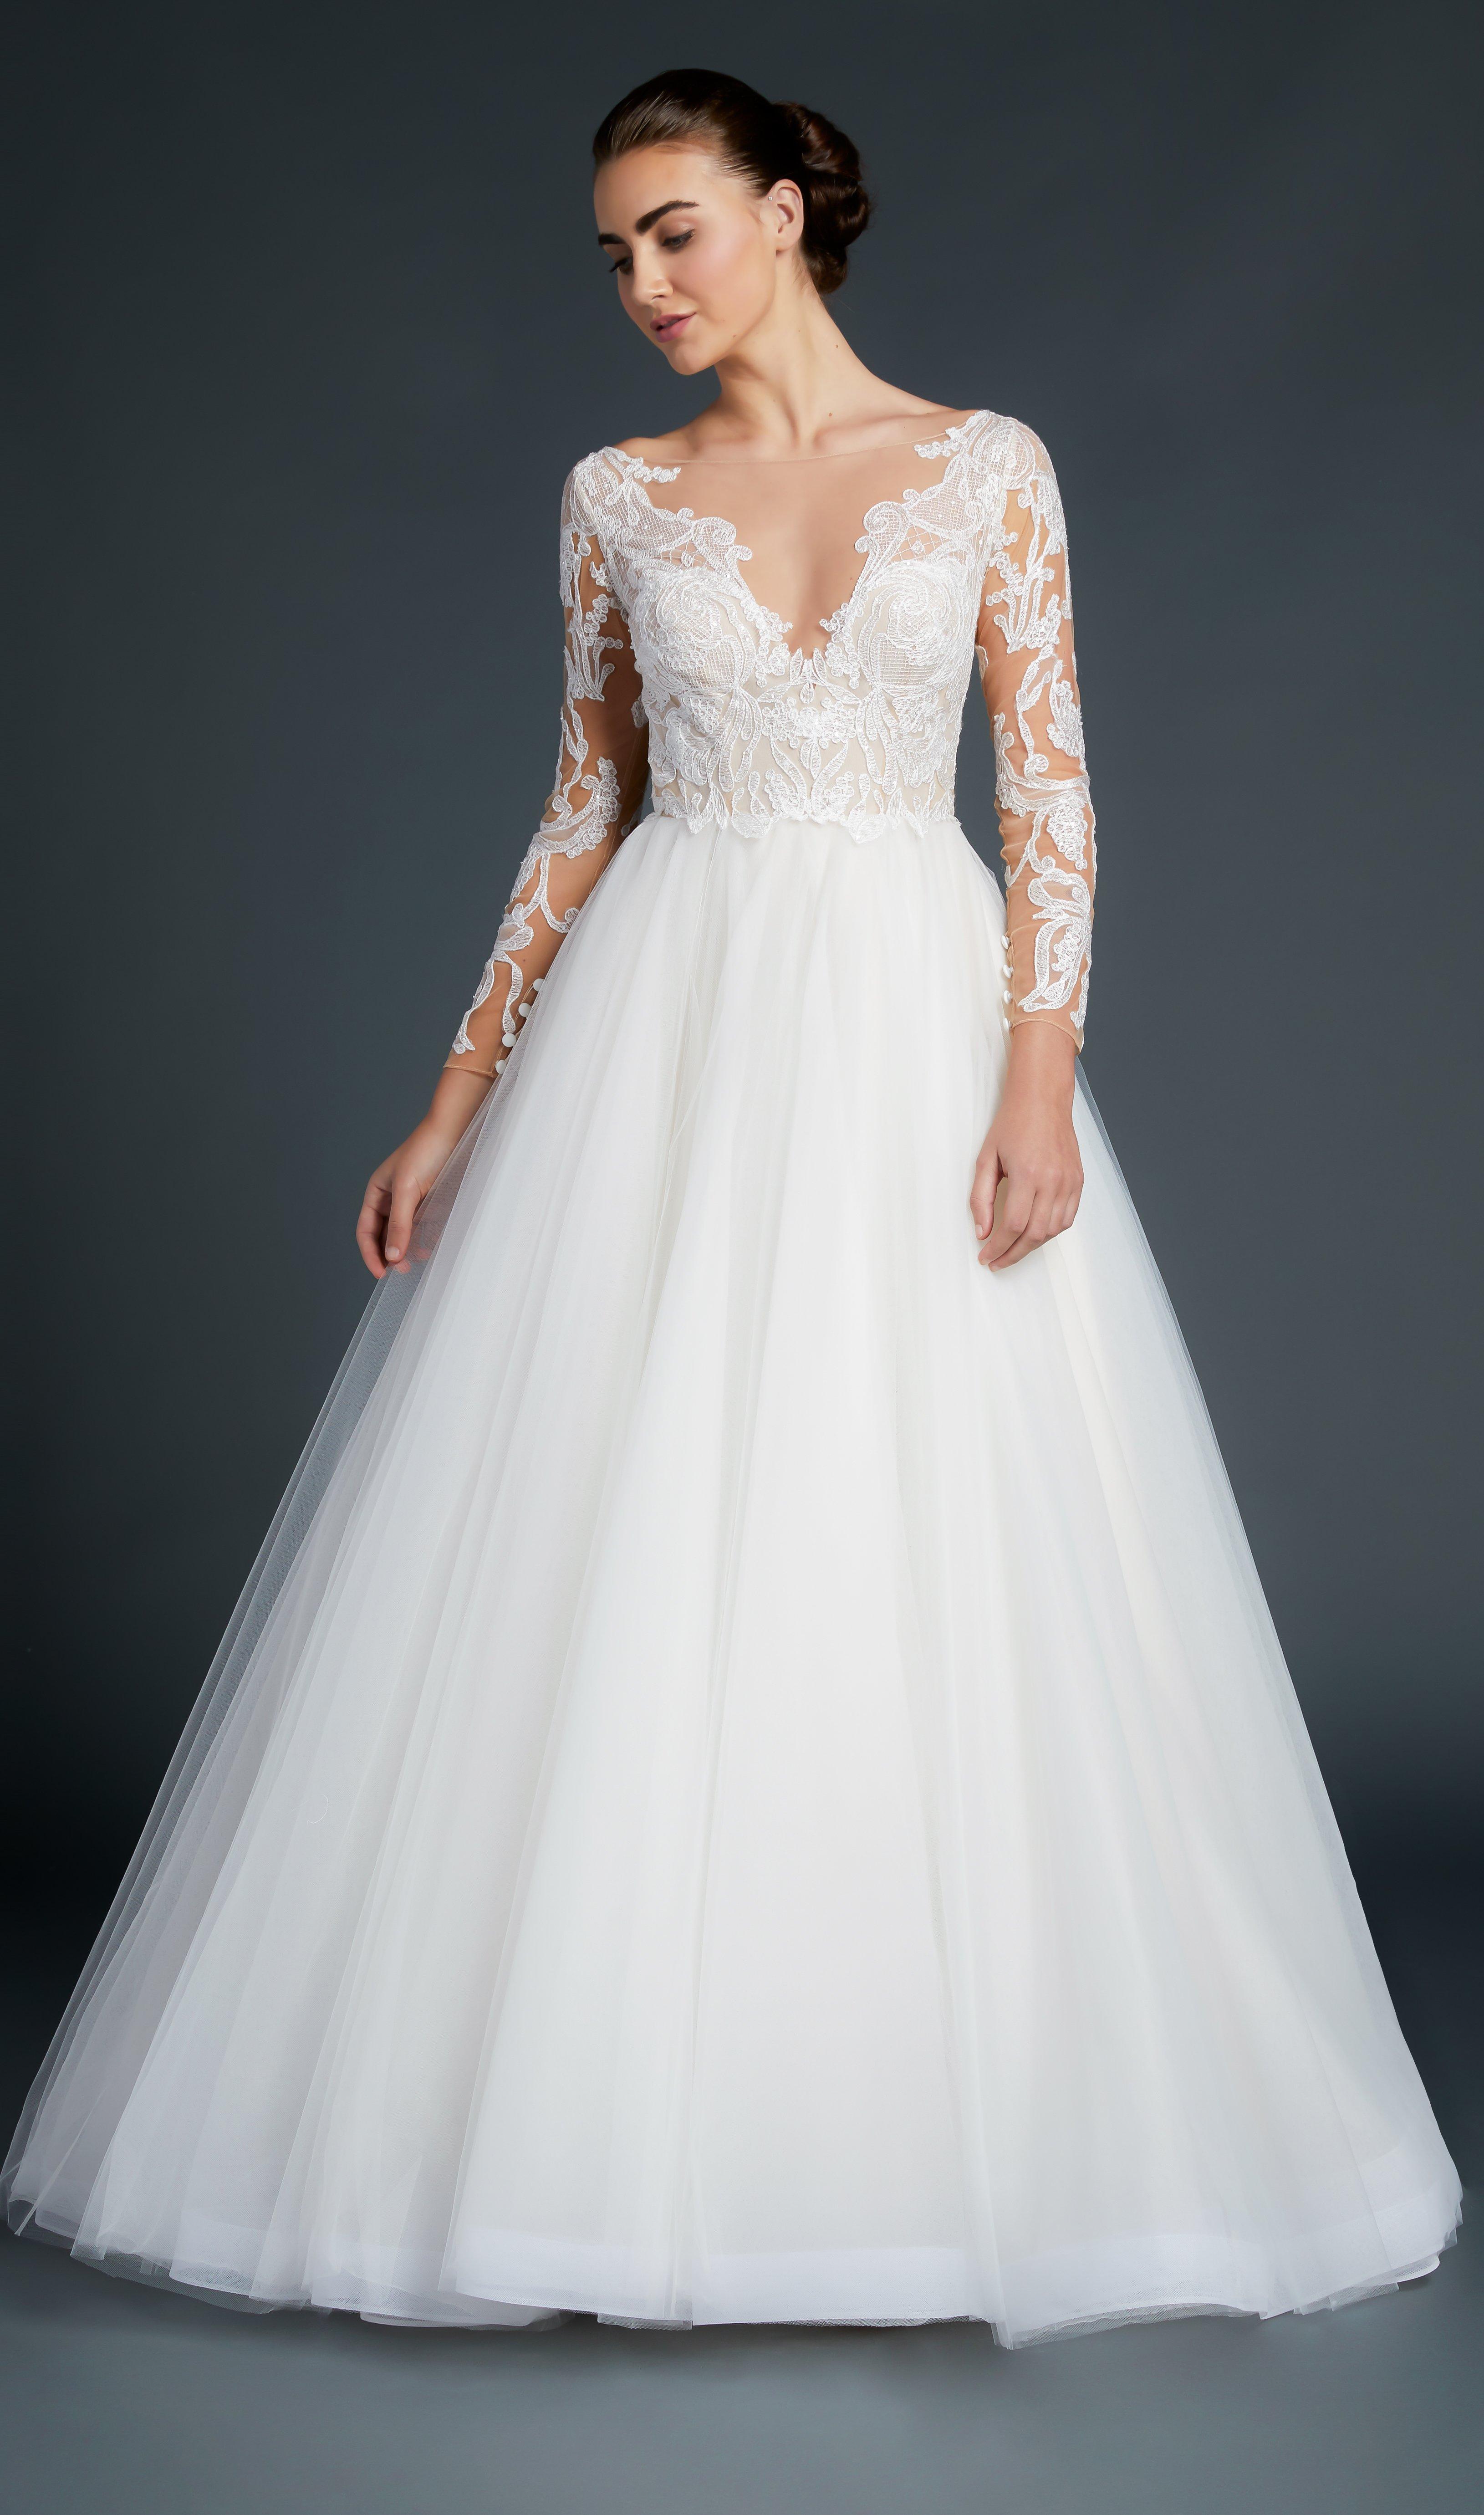 8d797a8cf459 V-neck Lace Long Sleeve Bodice Tulle Skirt Wedding Dress | Kleinfeld Bridal